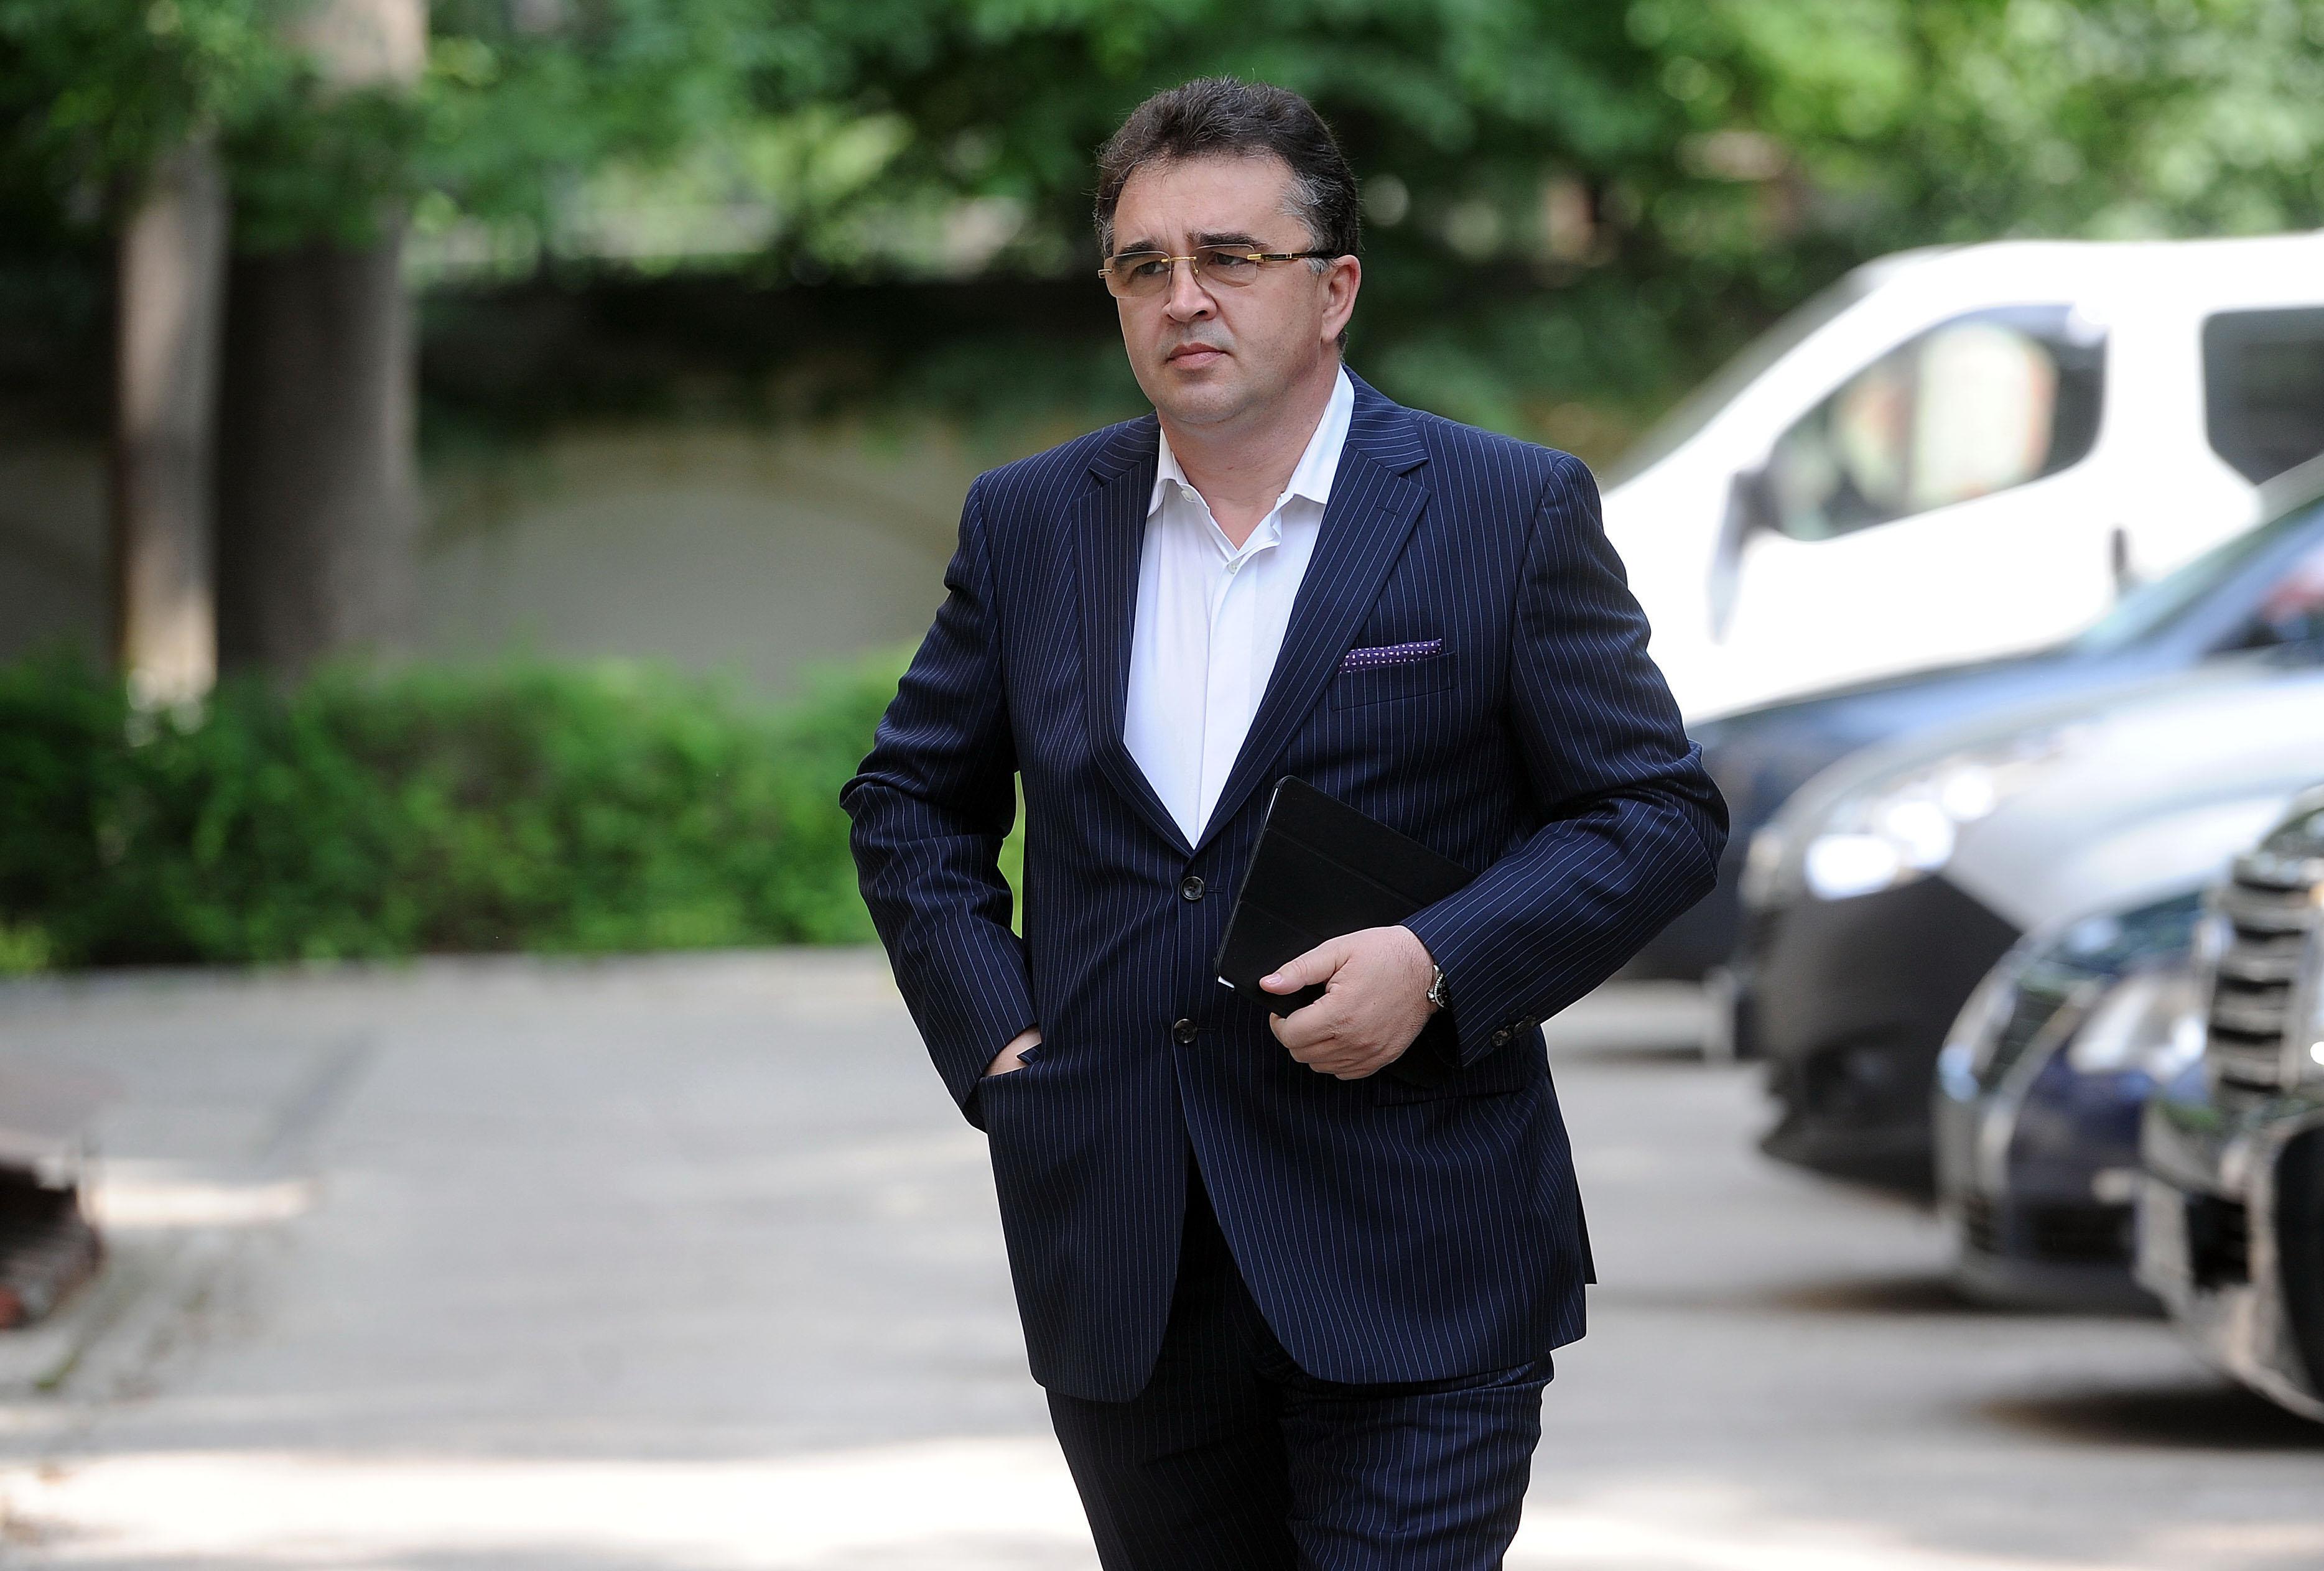 Sedinta tensionata la PSD, in prima intalnire dupa plecarea lui Ponta in Turcia. Marian Oprisan: